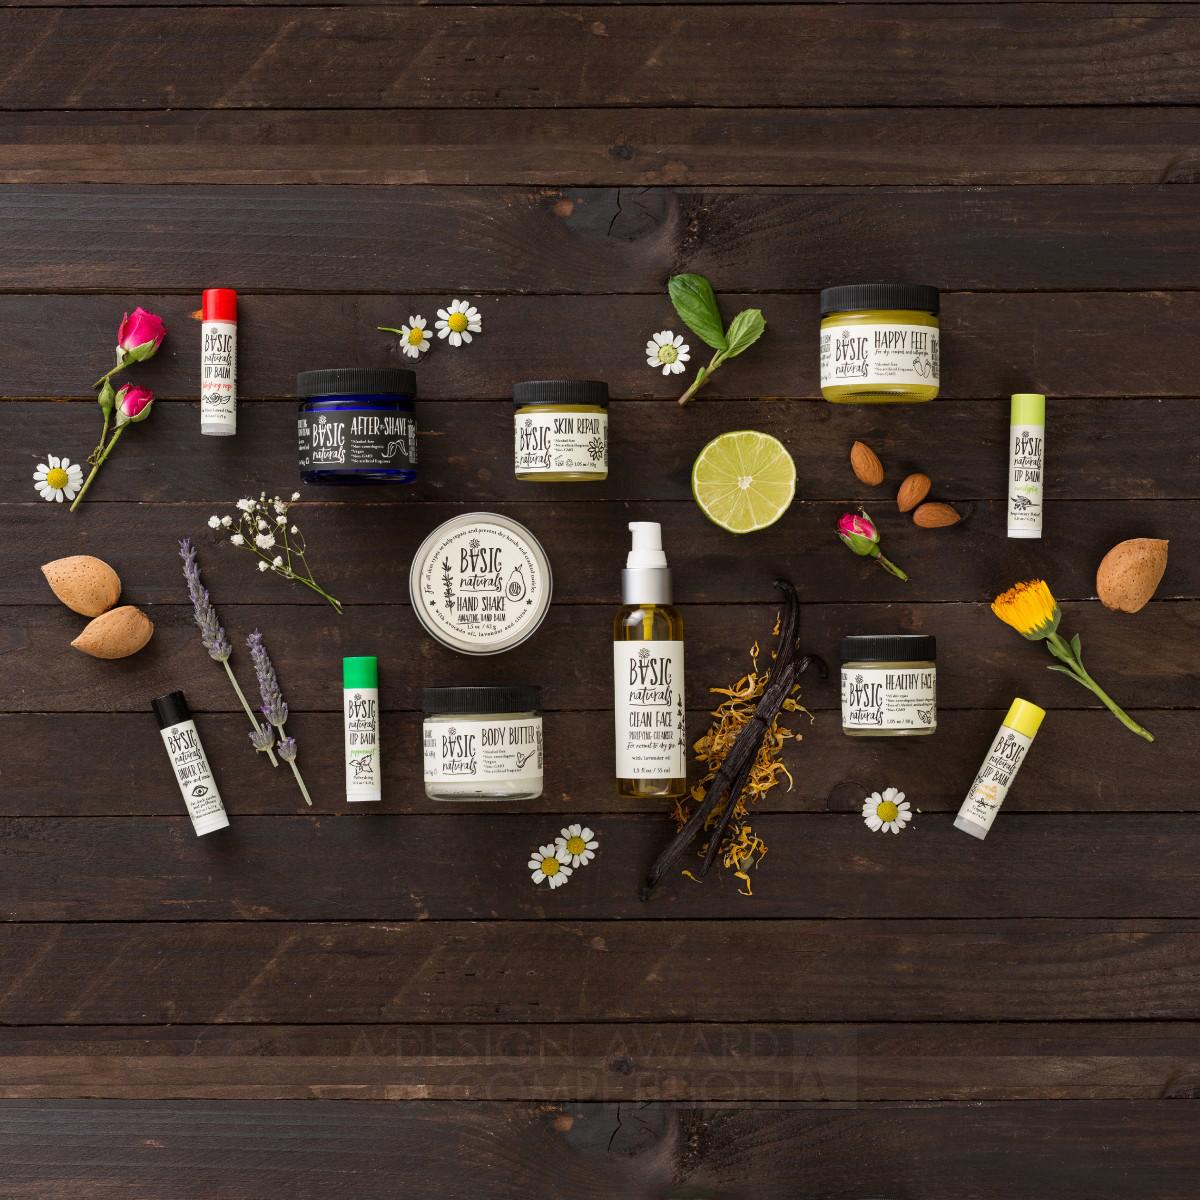 Basic Naturals Natural Cosmetics